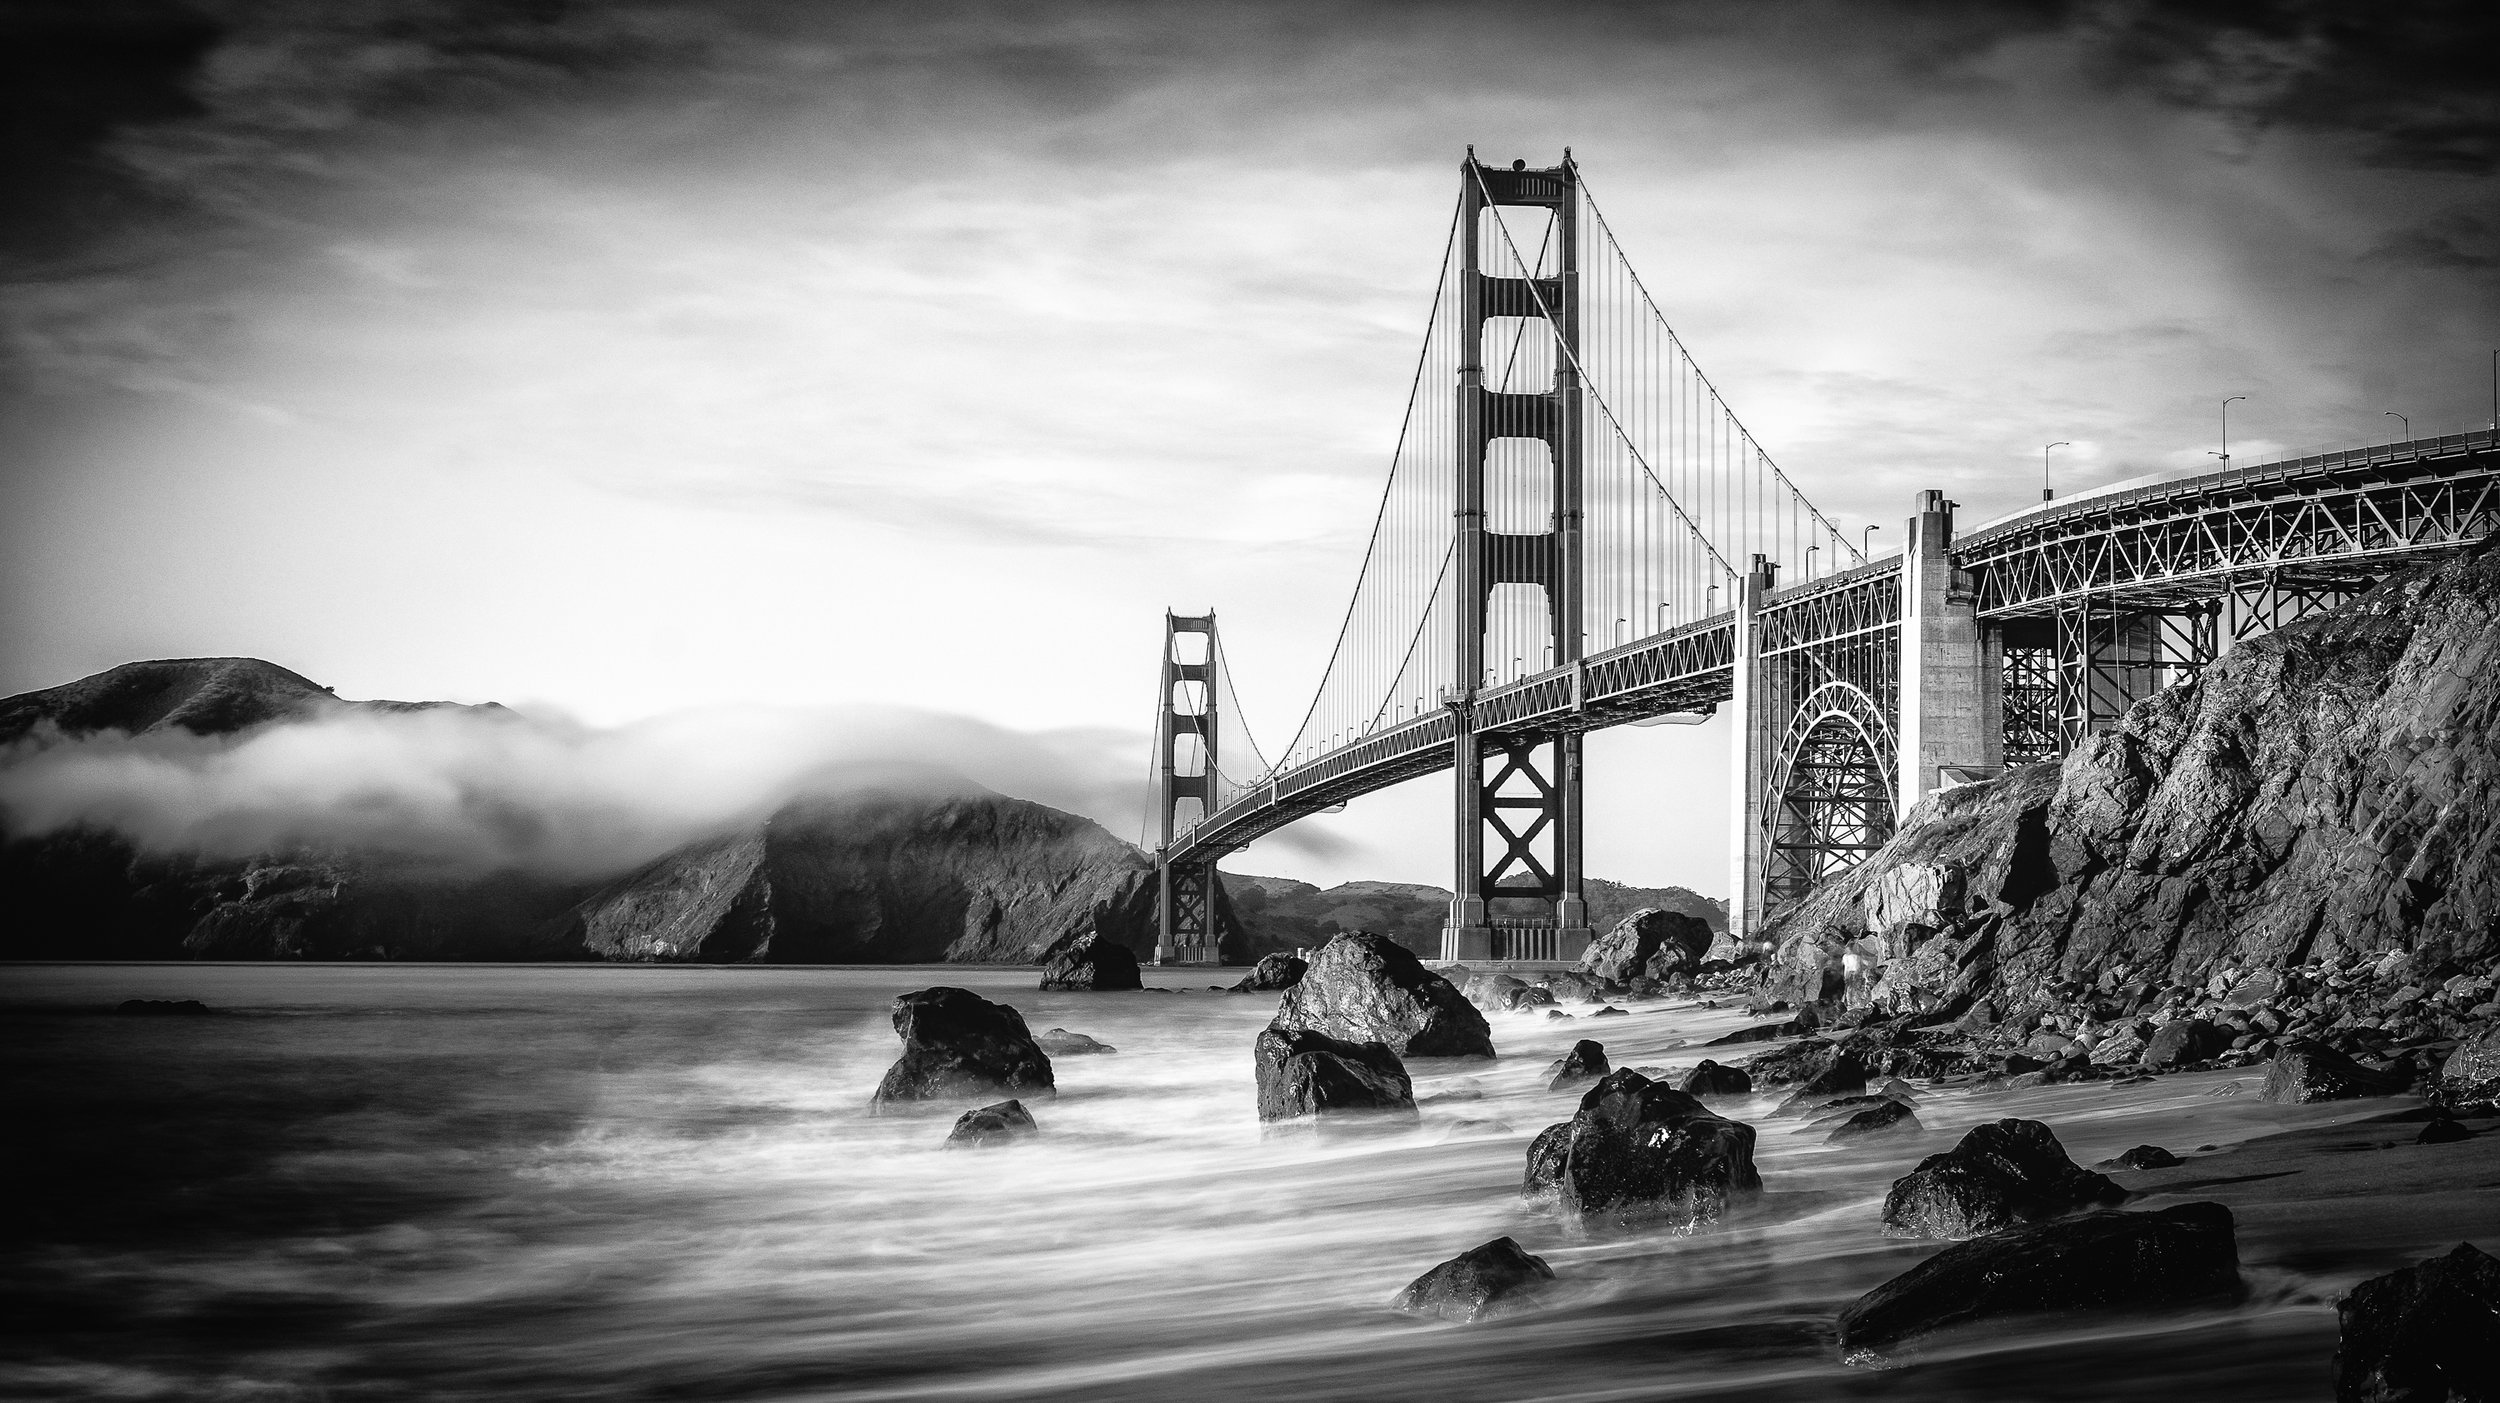 Golden Gate Bridge | San Fransisco, CA | March, 2018